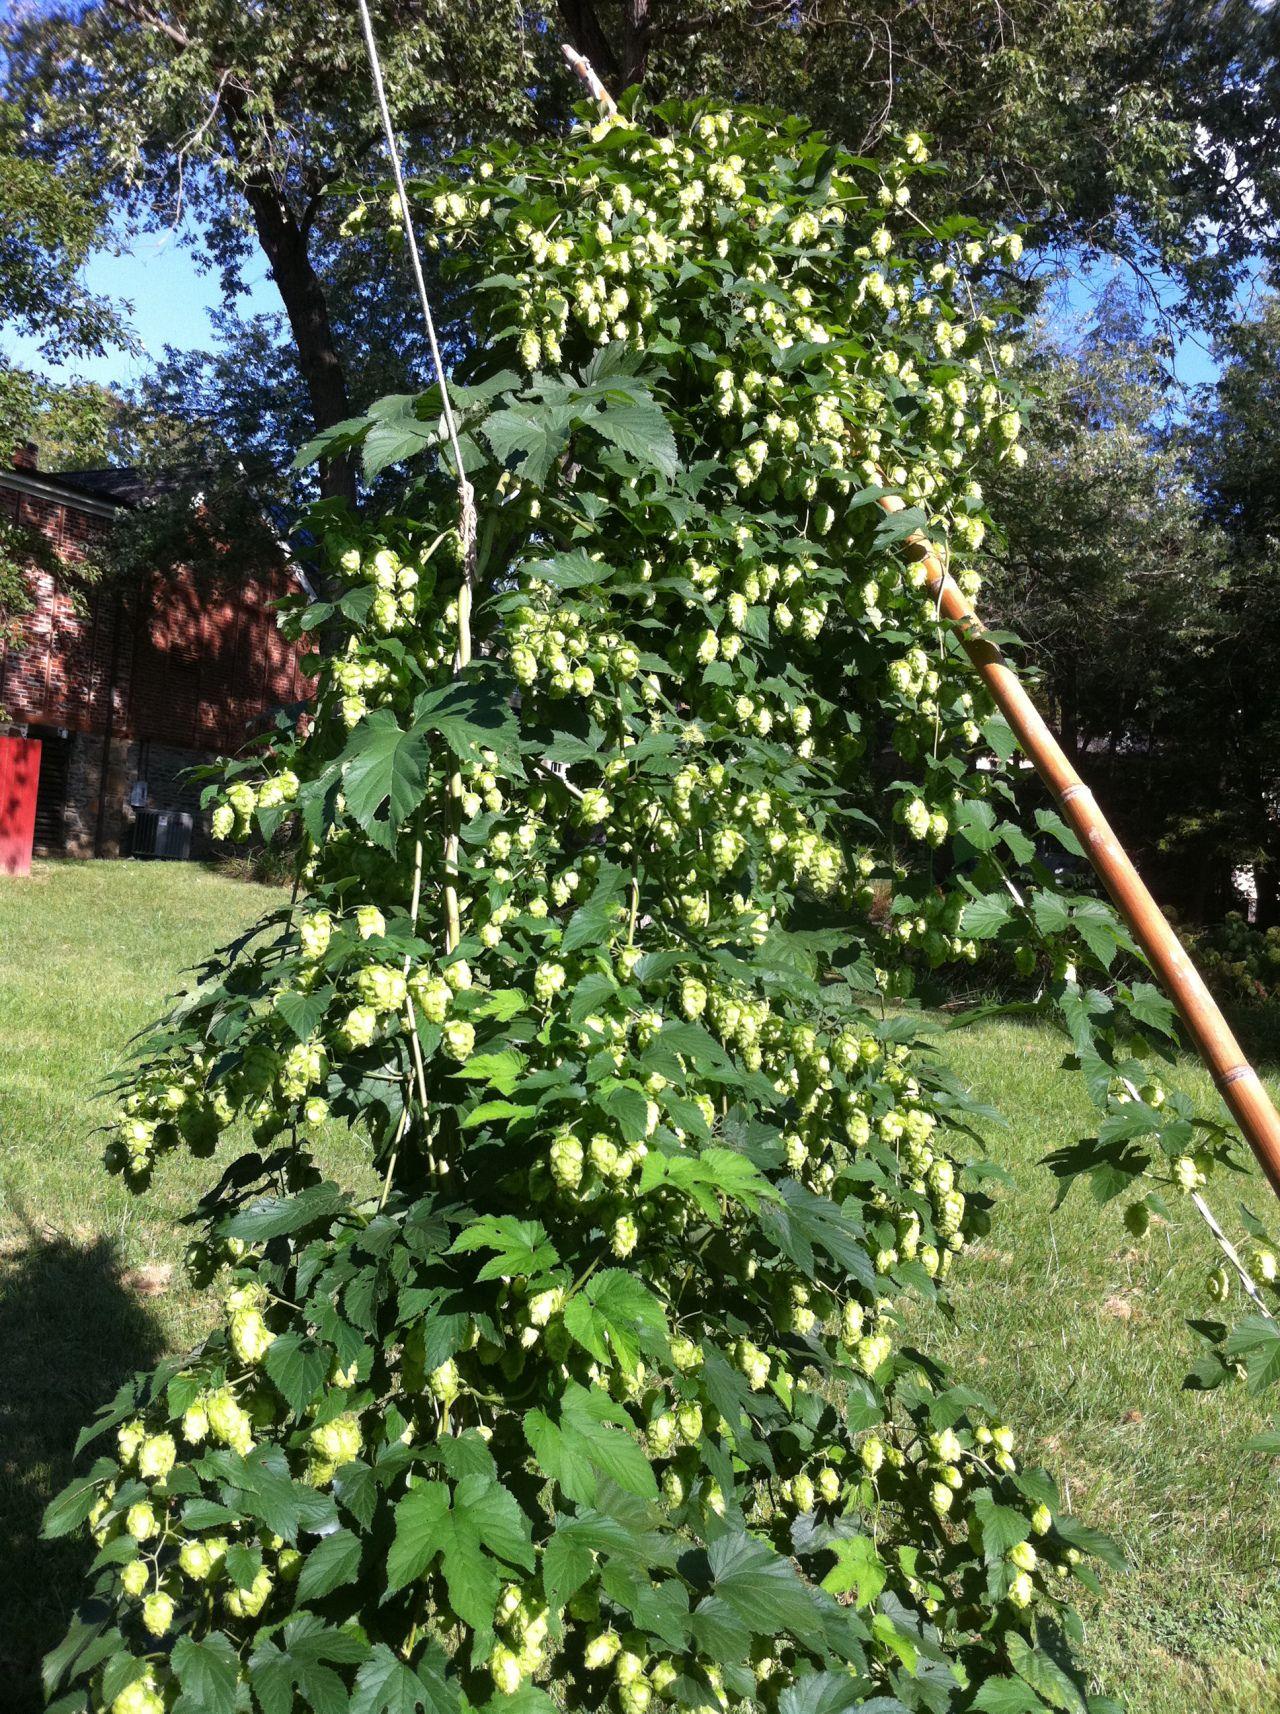 Growing hops part i hops plant hops trellis home brewing